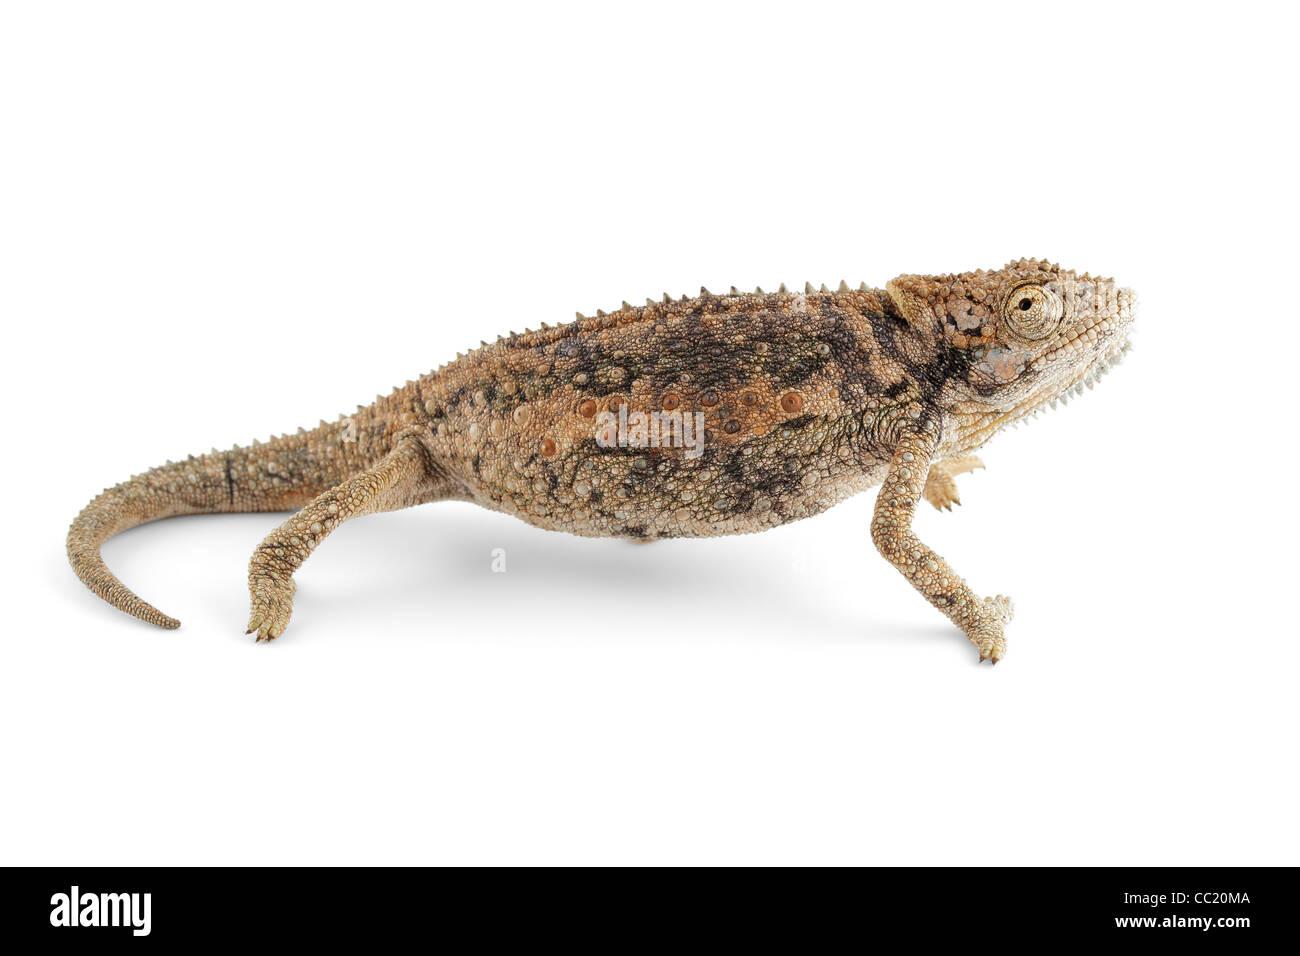 Dwarf African Chameleon (Bradypodium karrooicum) on white - Stock Image